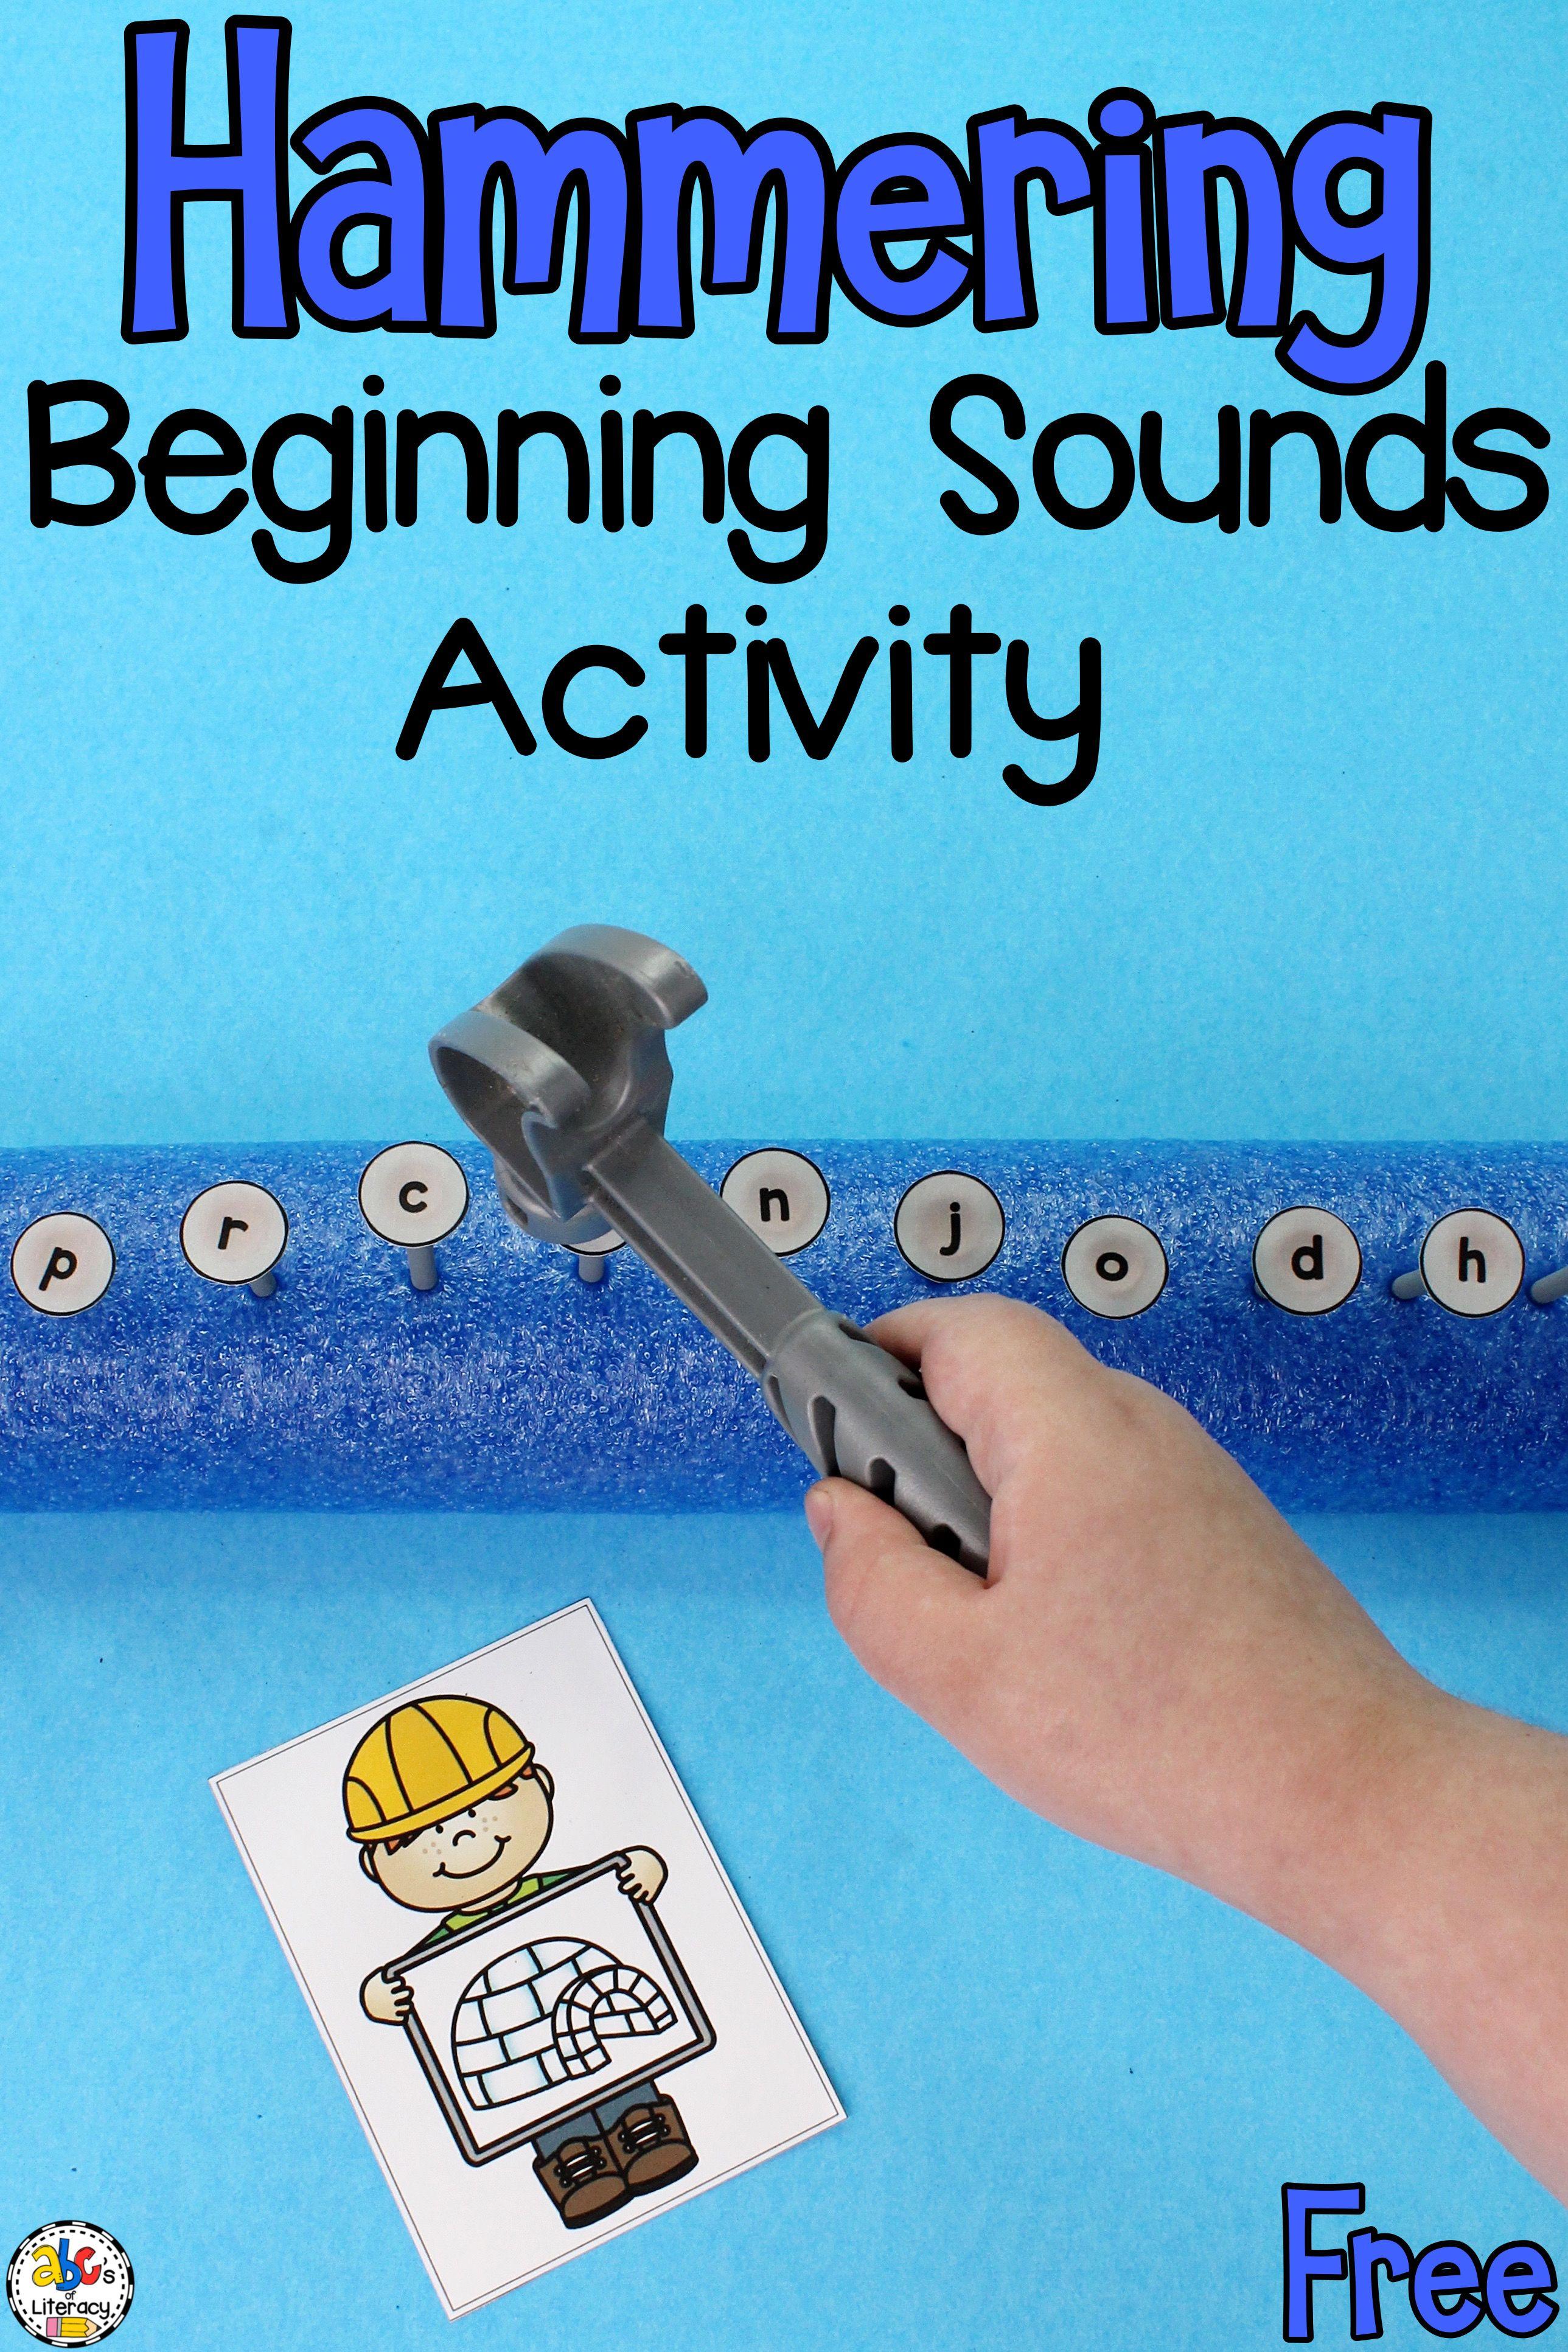 Hammering Beginning Sounds Activity Phonics Activity In